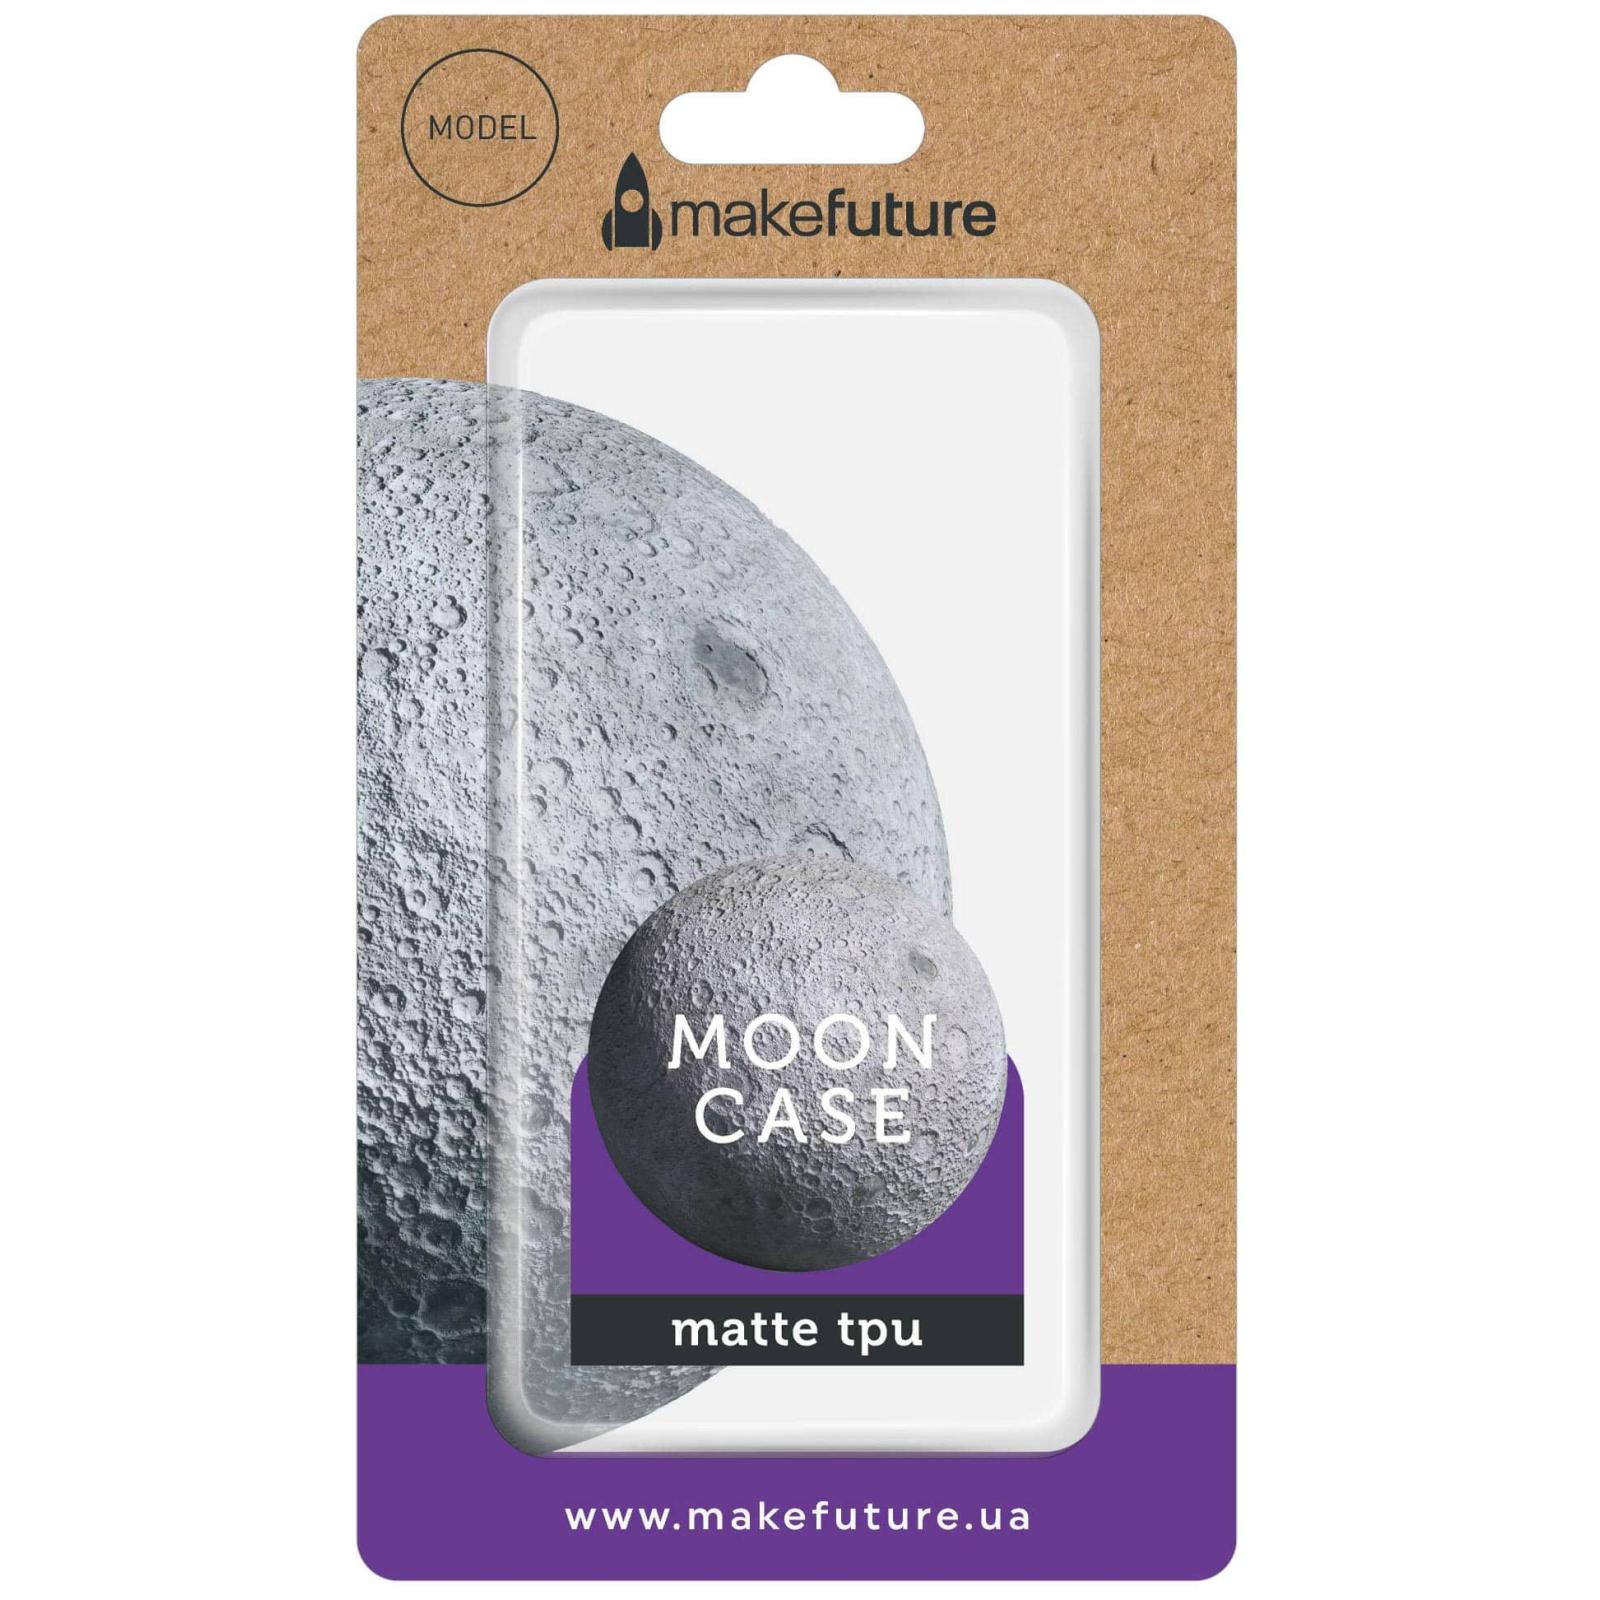 Чехол для моб. телефона MakeFuture Moon Case (TPU) для Apple iPhone 6 Black (MCM-AI6BK) изображение 4